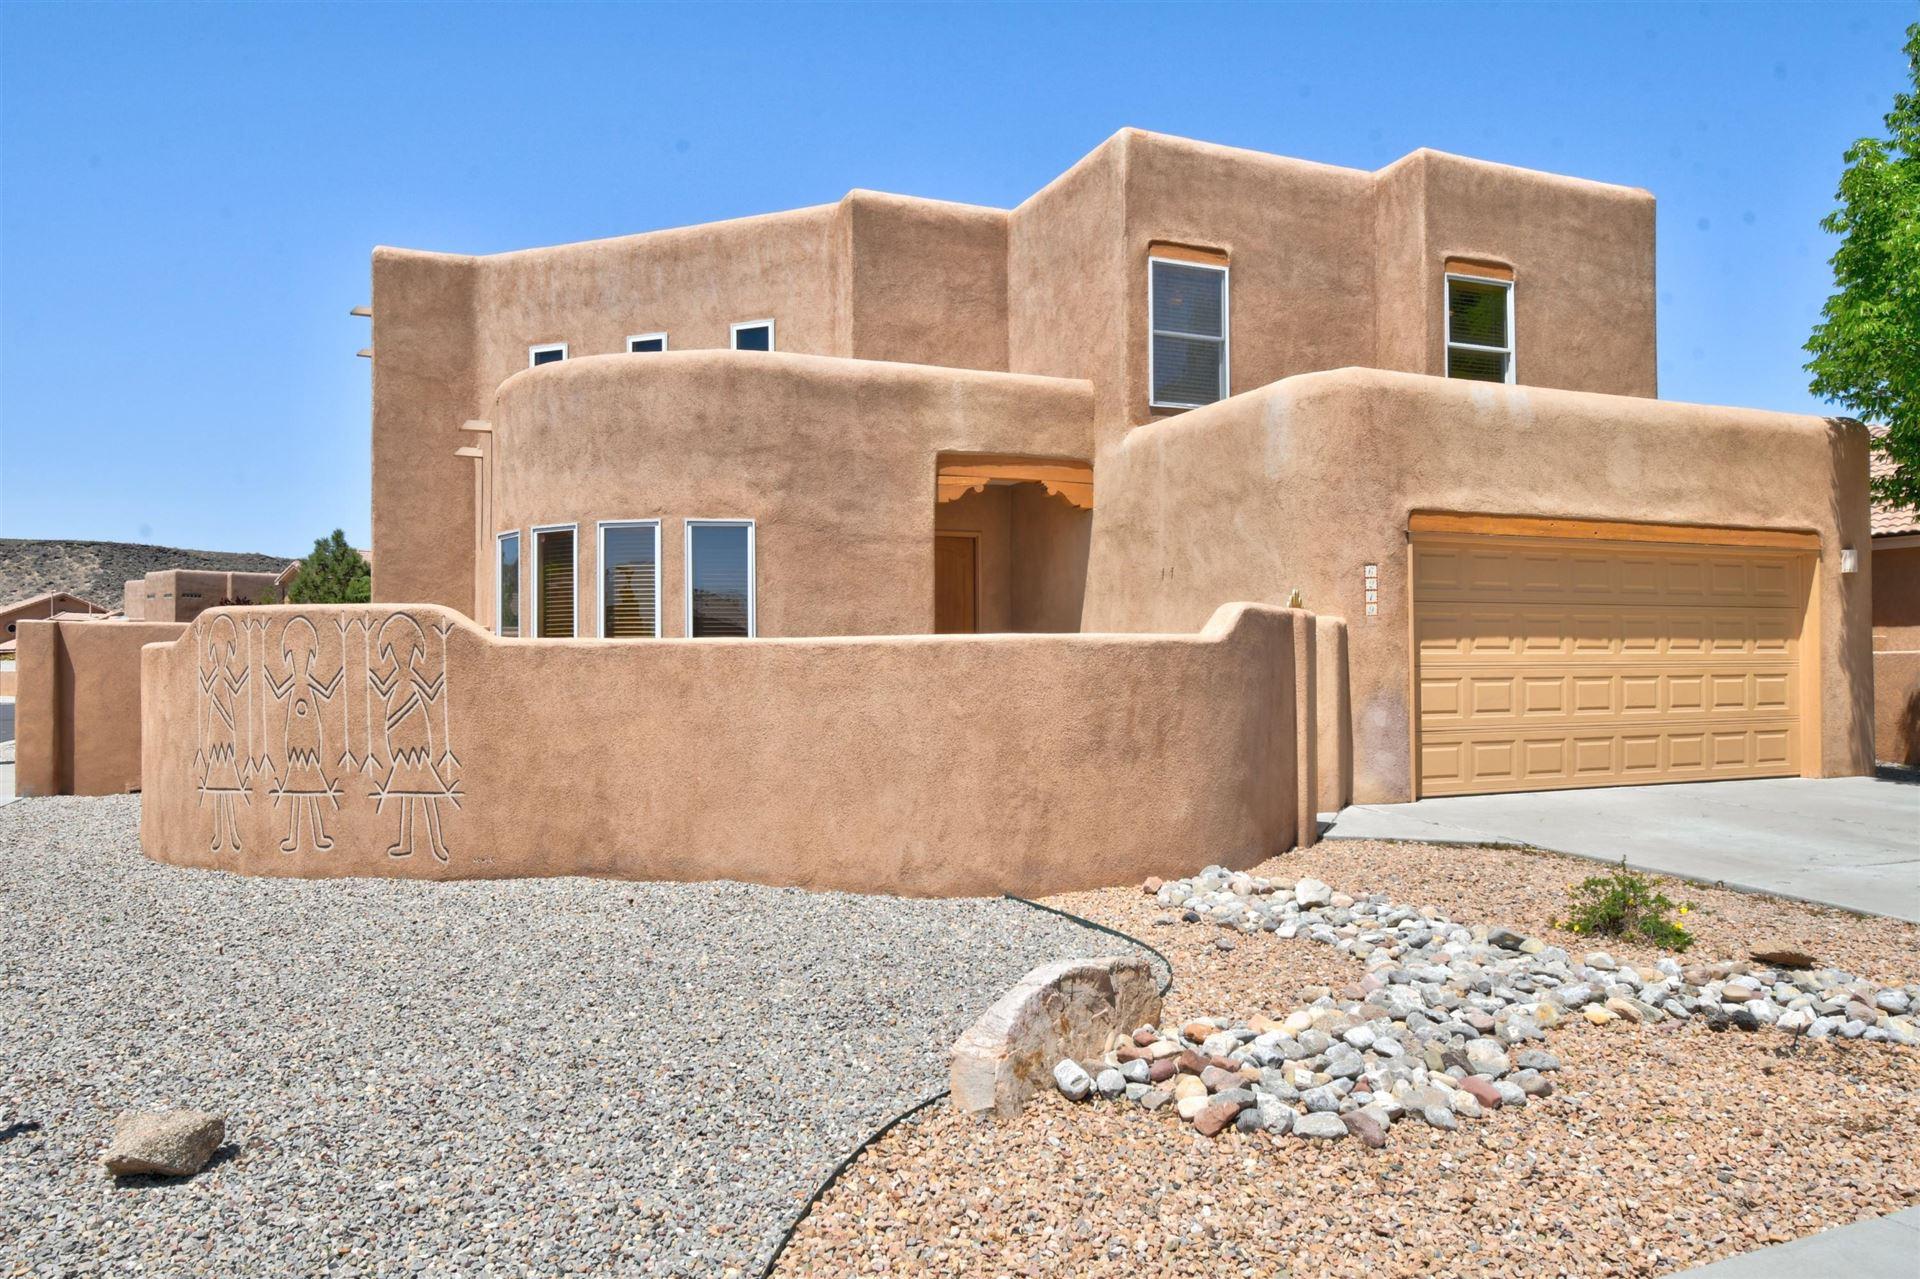 6219 Chenoa Road NW, Albuquerque, NM 87120 - #: 991862